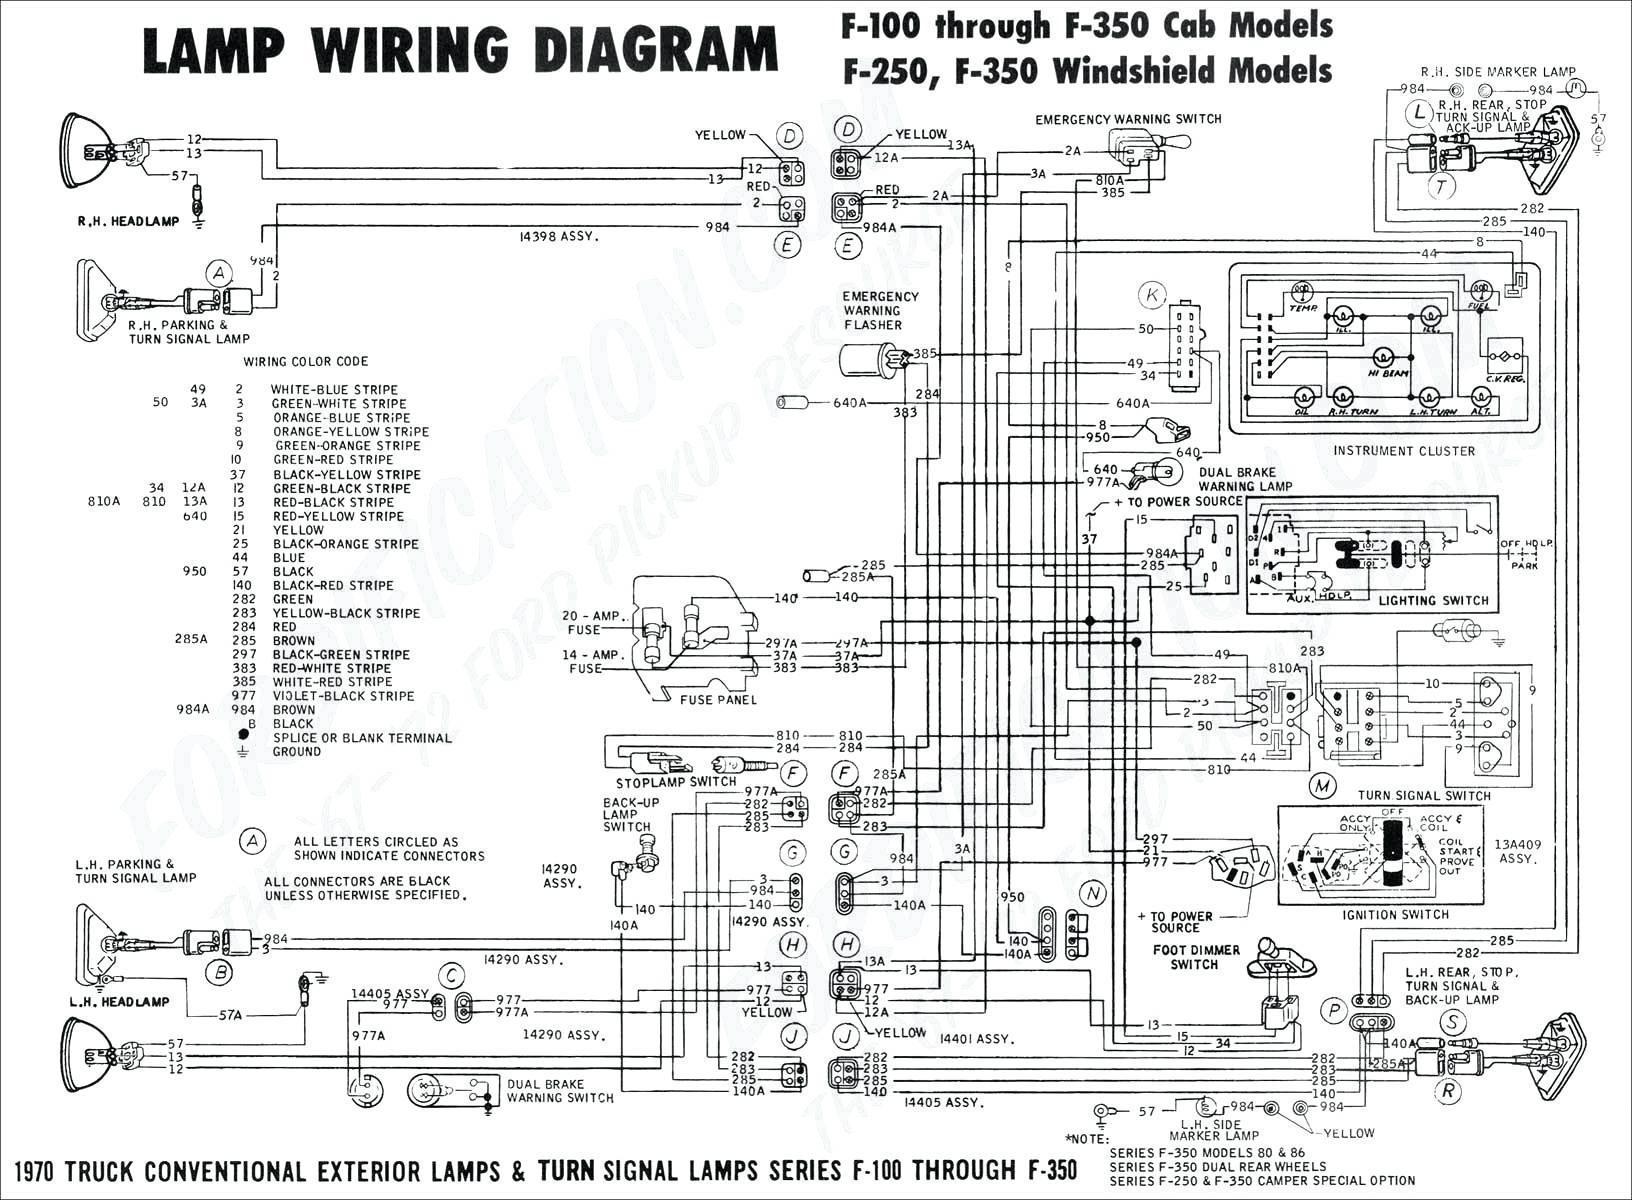 1998 Dodge Ram 1500 Tail Light Wiring Diagram 2003 Dodge Ram 1500 Tail Light Wiring Diagram Best 2006 Parking Of 1998 Dodge Ram 1500 Tail Light Wiring Diagram